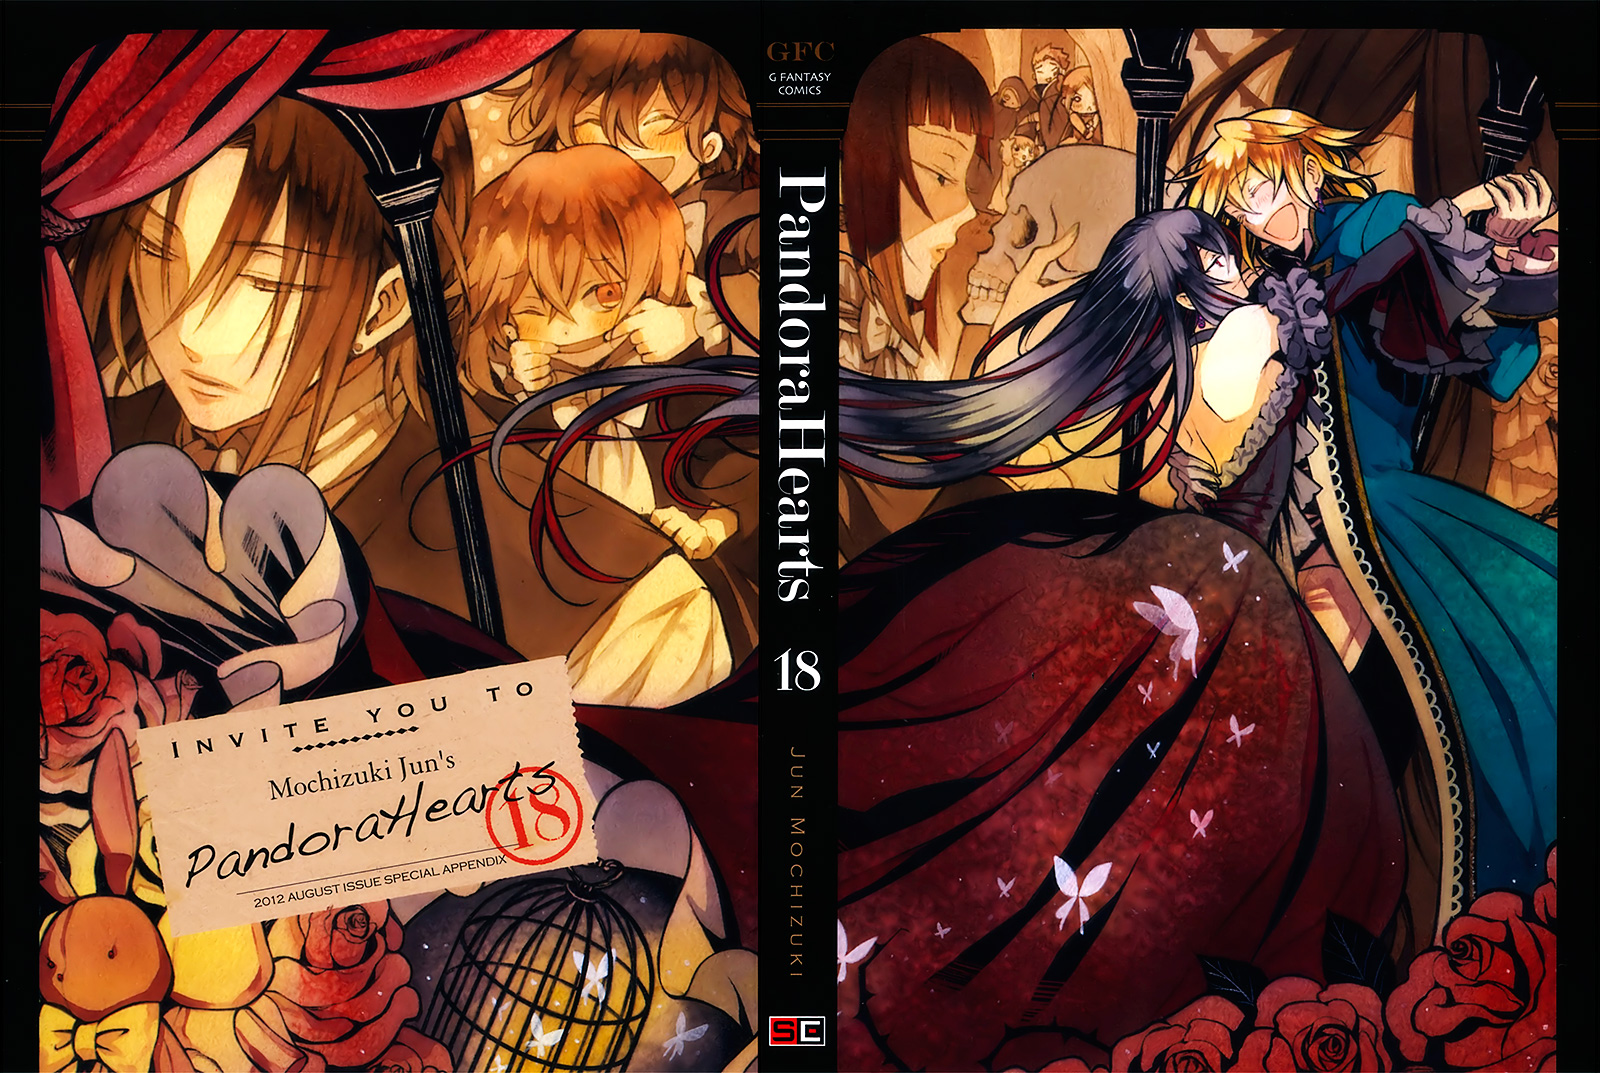 Pandora Hearts chương 075 - retrace: lxxv alone trang 3